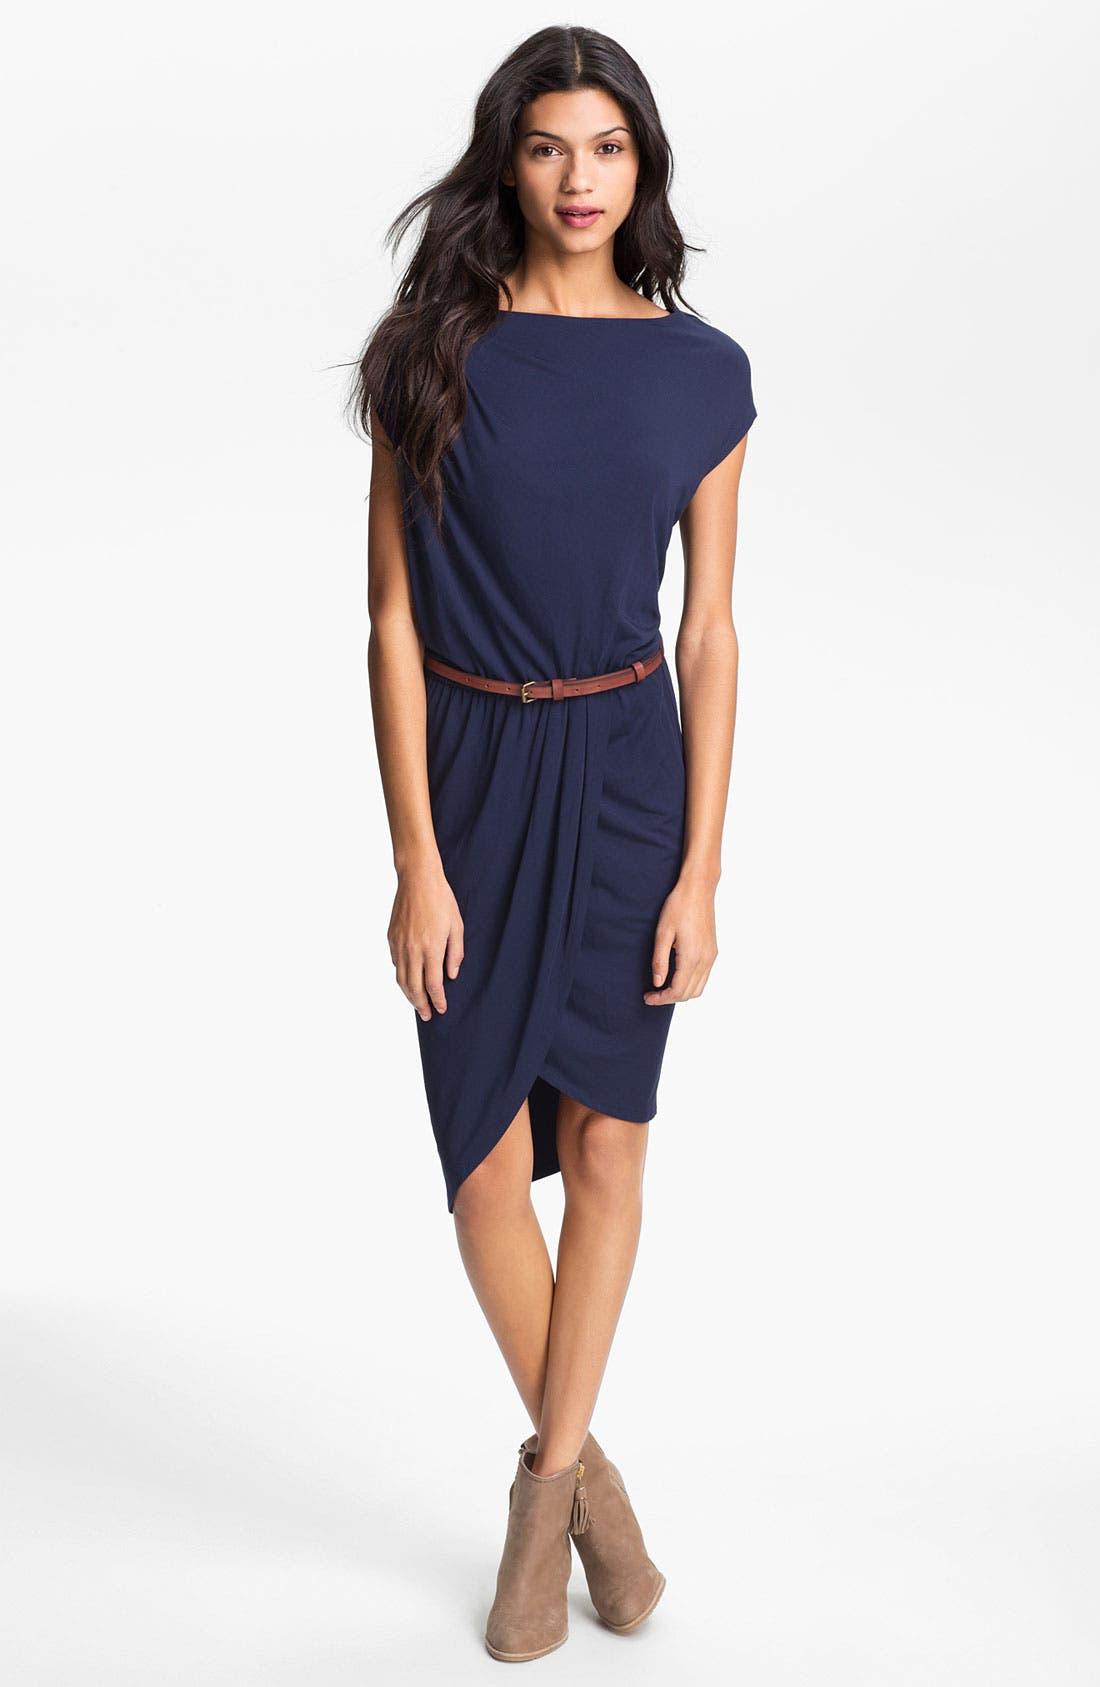 Alternate Image 1 Selected - Tart 'Marine' Draped Jersey Dress